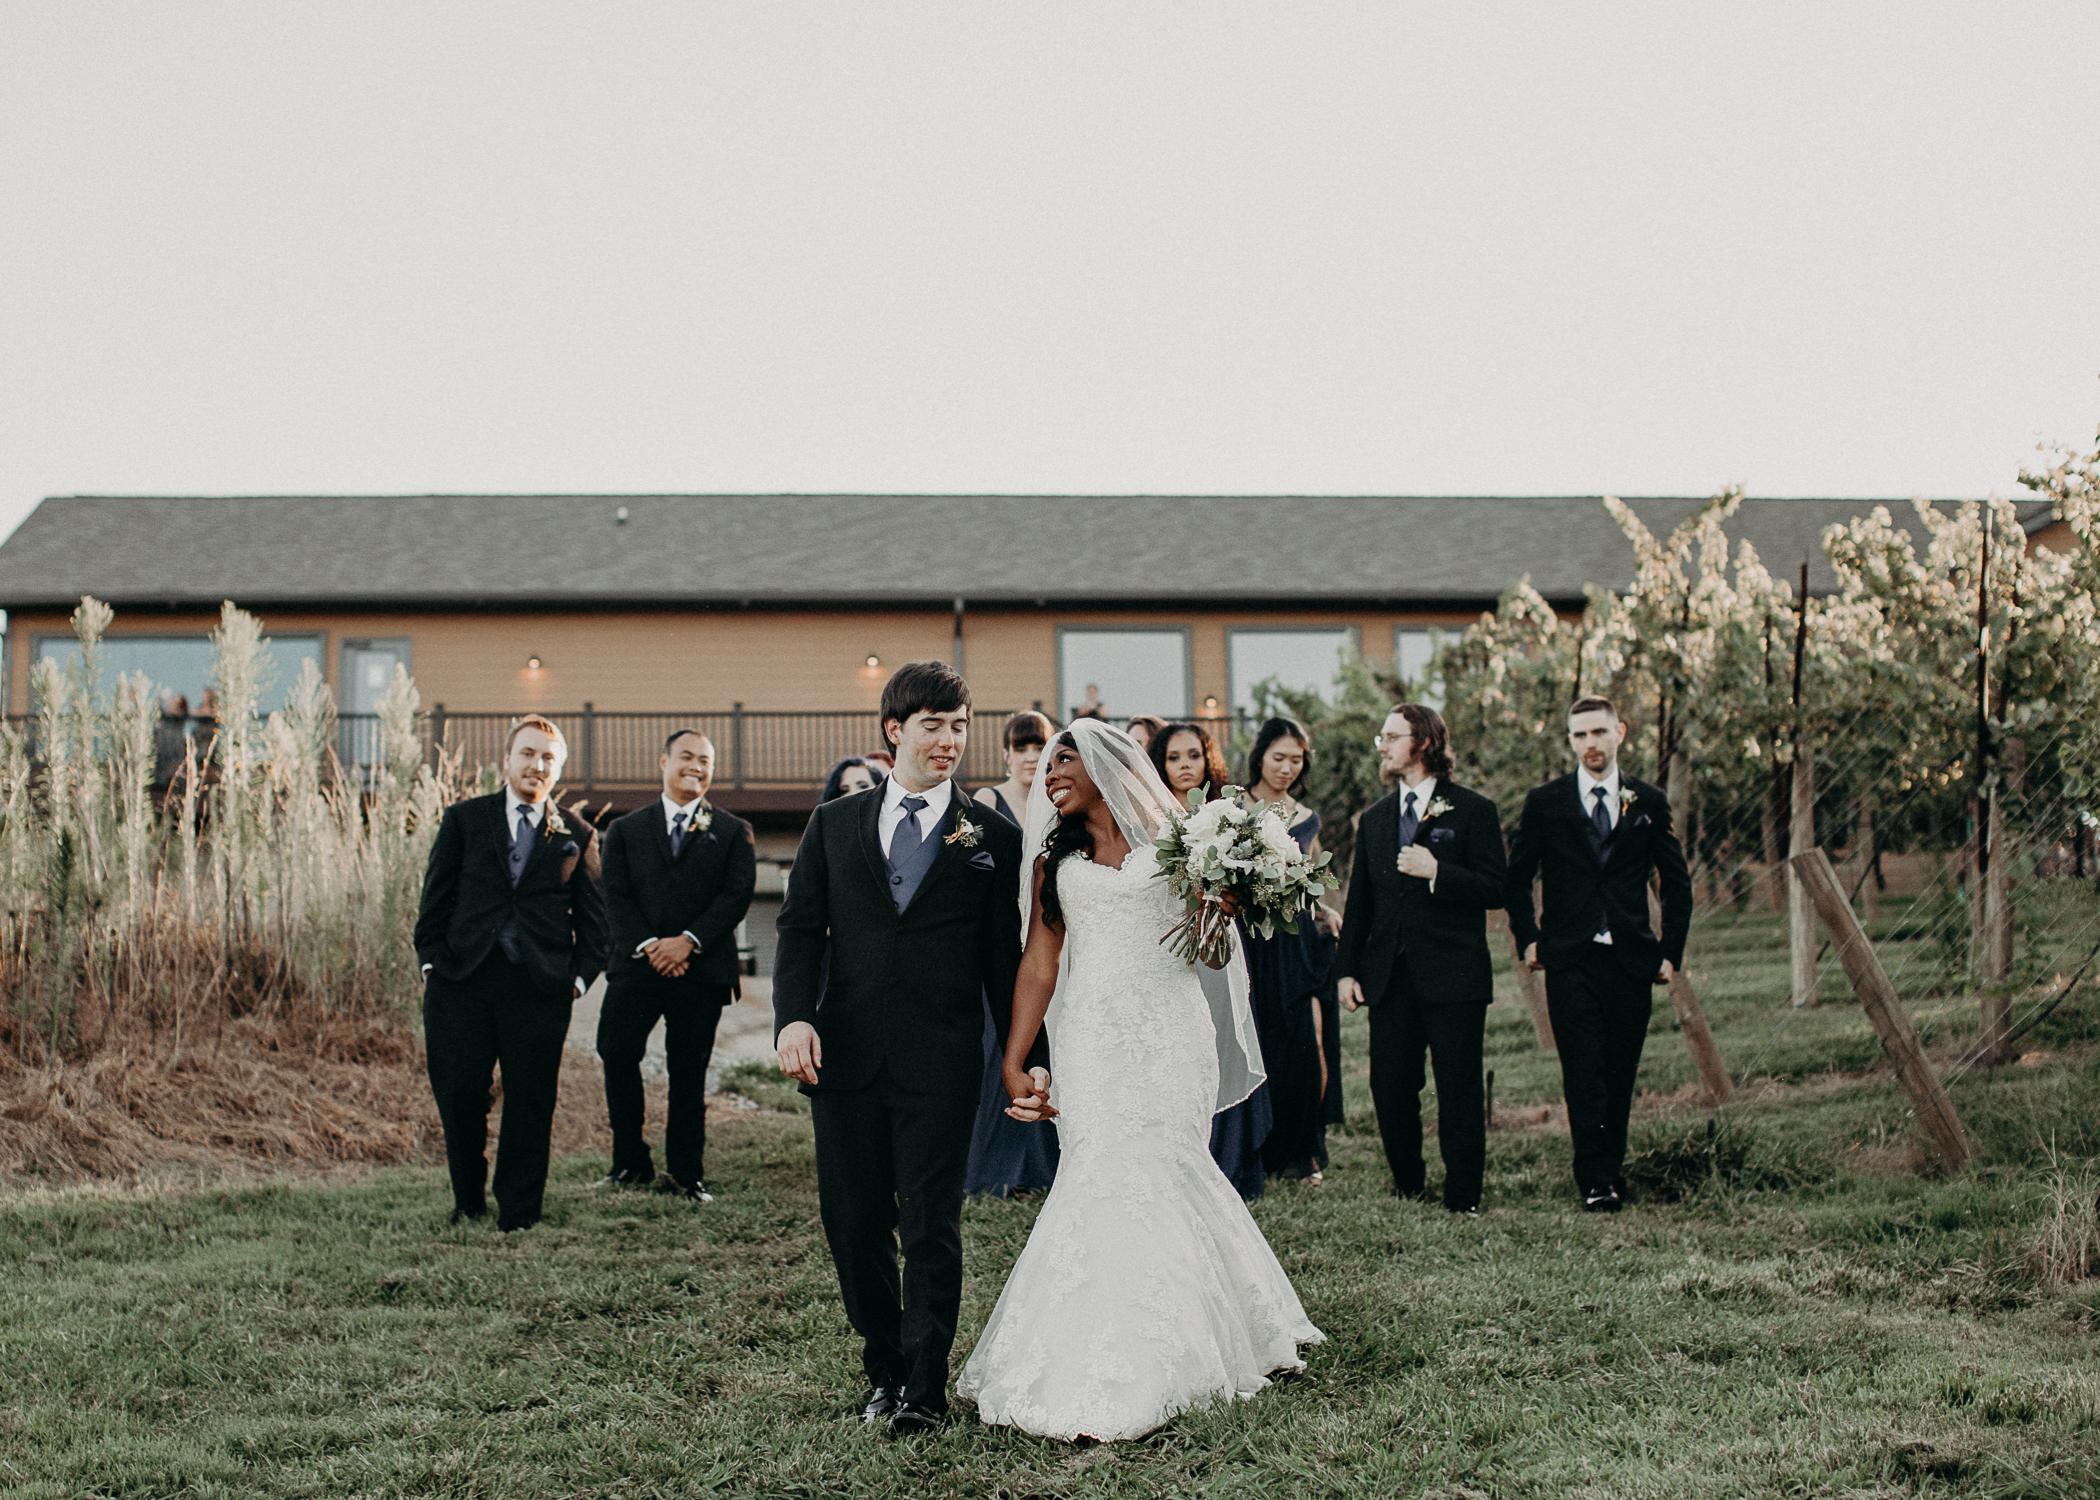 48- Kaya_vineyard_dahlonega_wedding_venue_bridal_party_portraits_aline_marin_photography.jpg